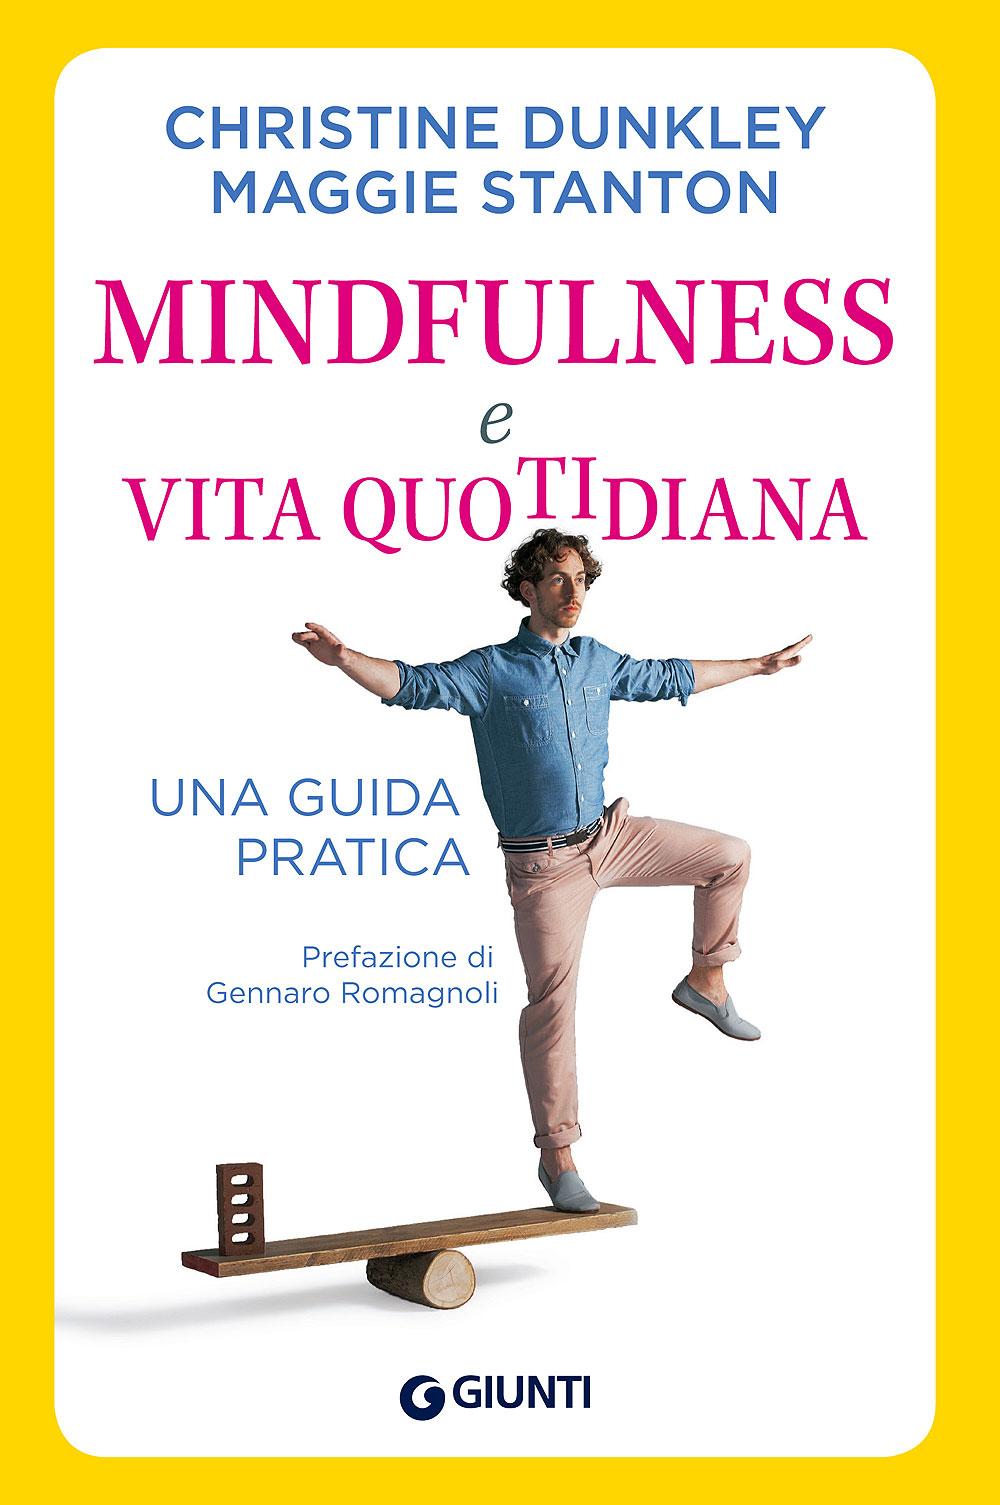 Mindfulness e vita quotidiana